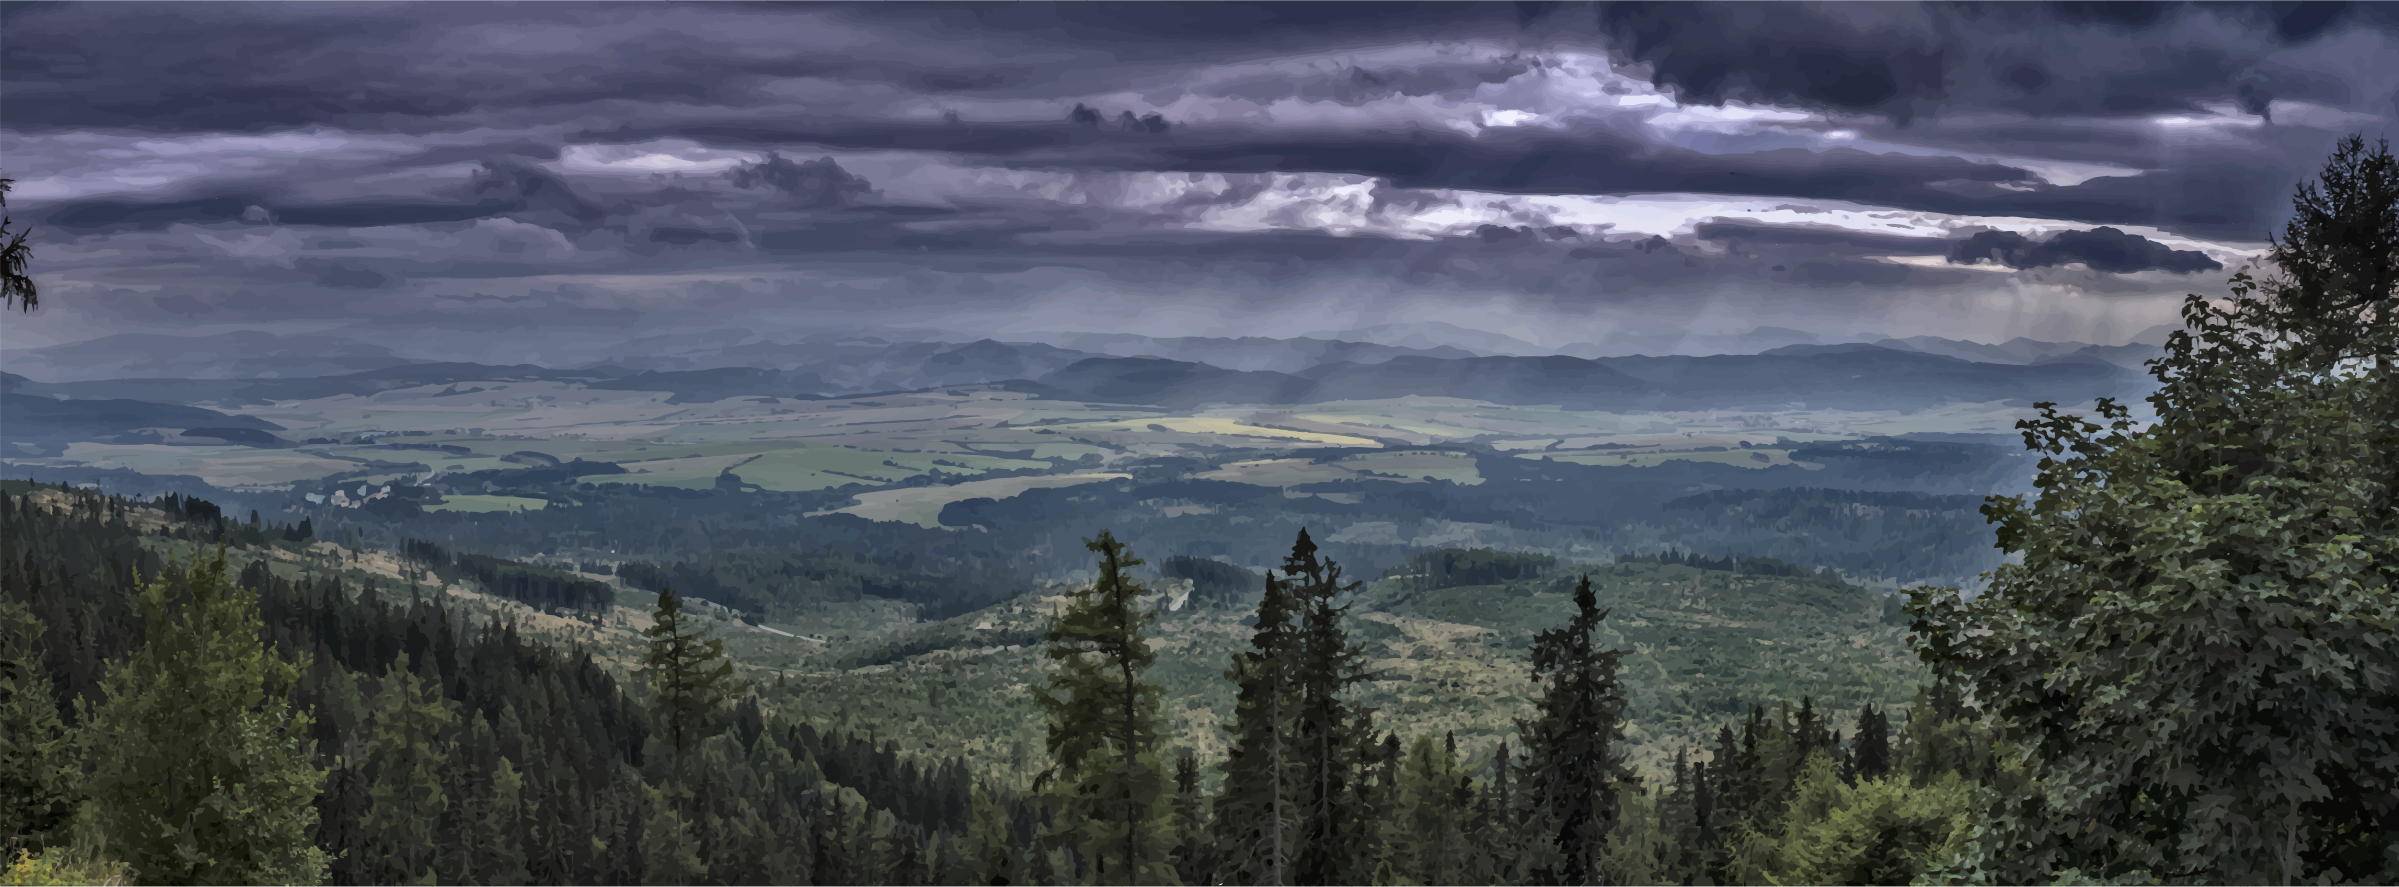 Splendor clipart Panorama Exalted Panorama Splendor Splendor